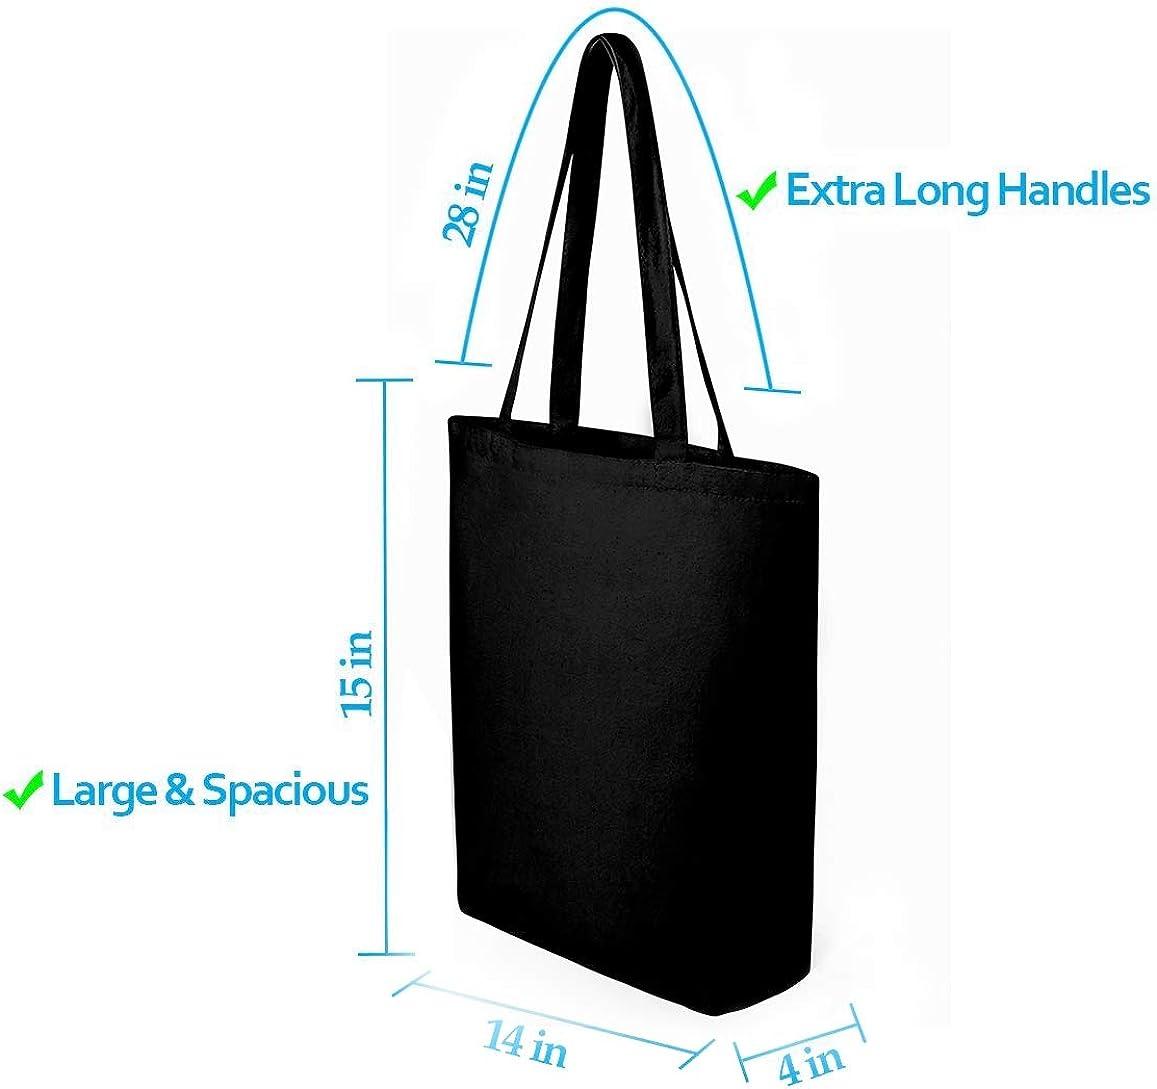 Travel Bag Reusable Shopping Bag Beach Bag Office Carry All Eco Friendly Bag Black Gold Kintsugi Tote Bag Grocery Tote